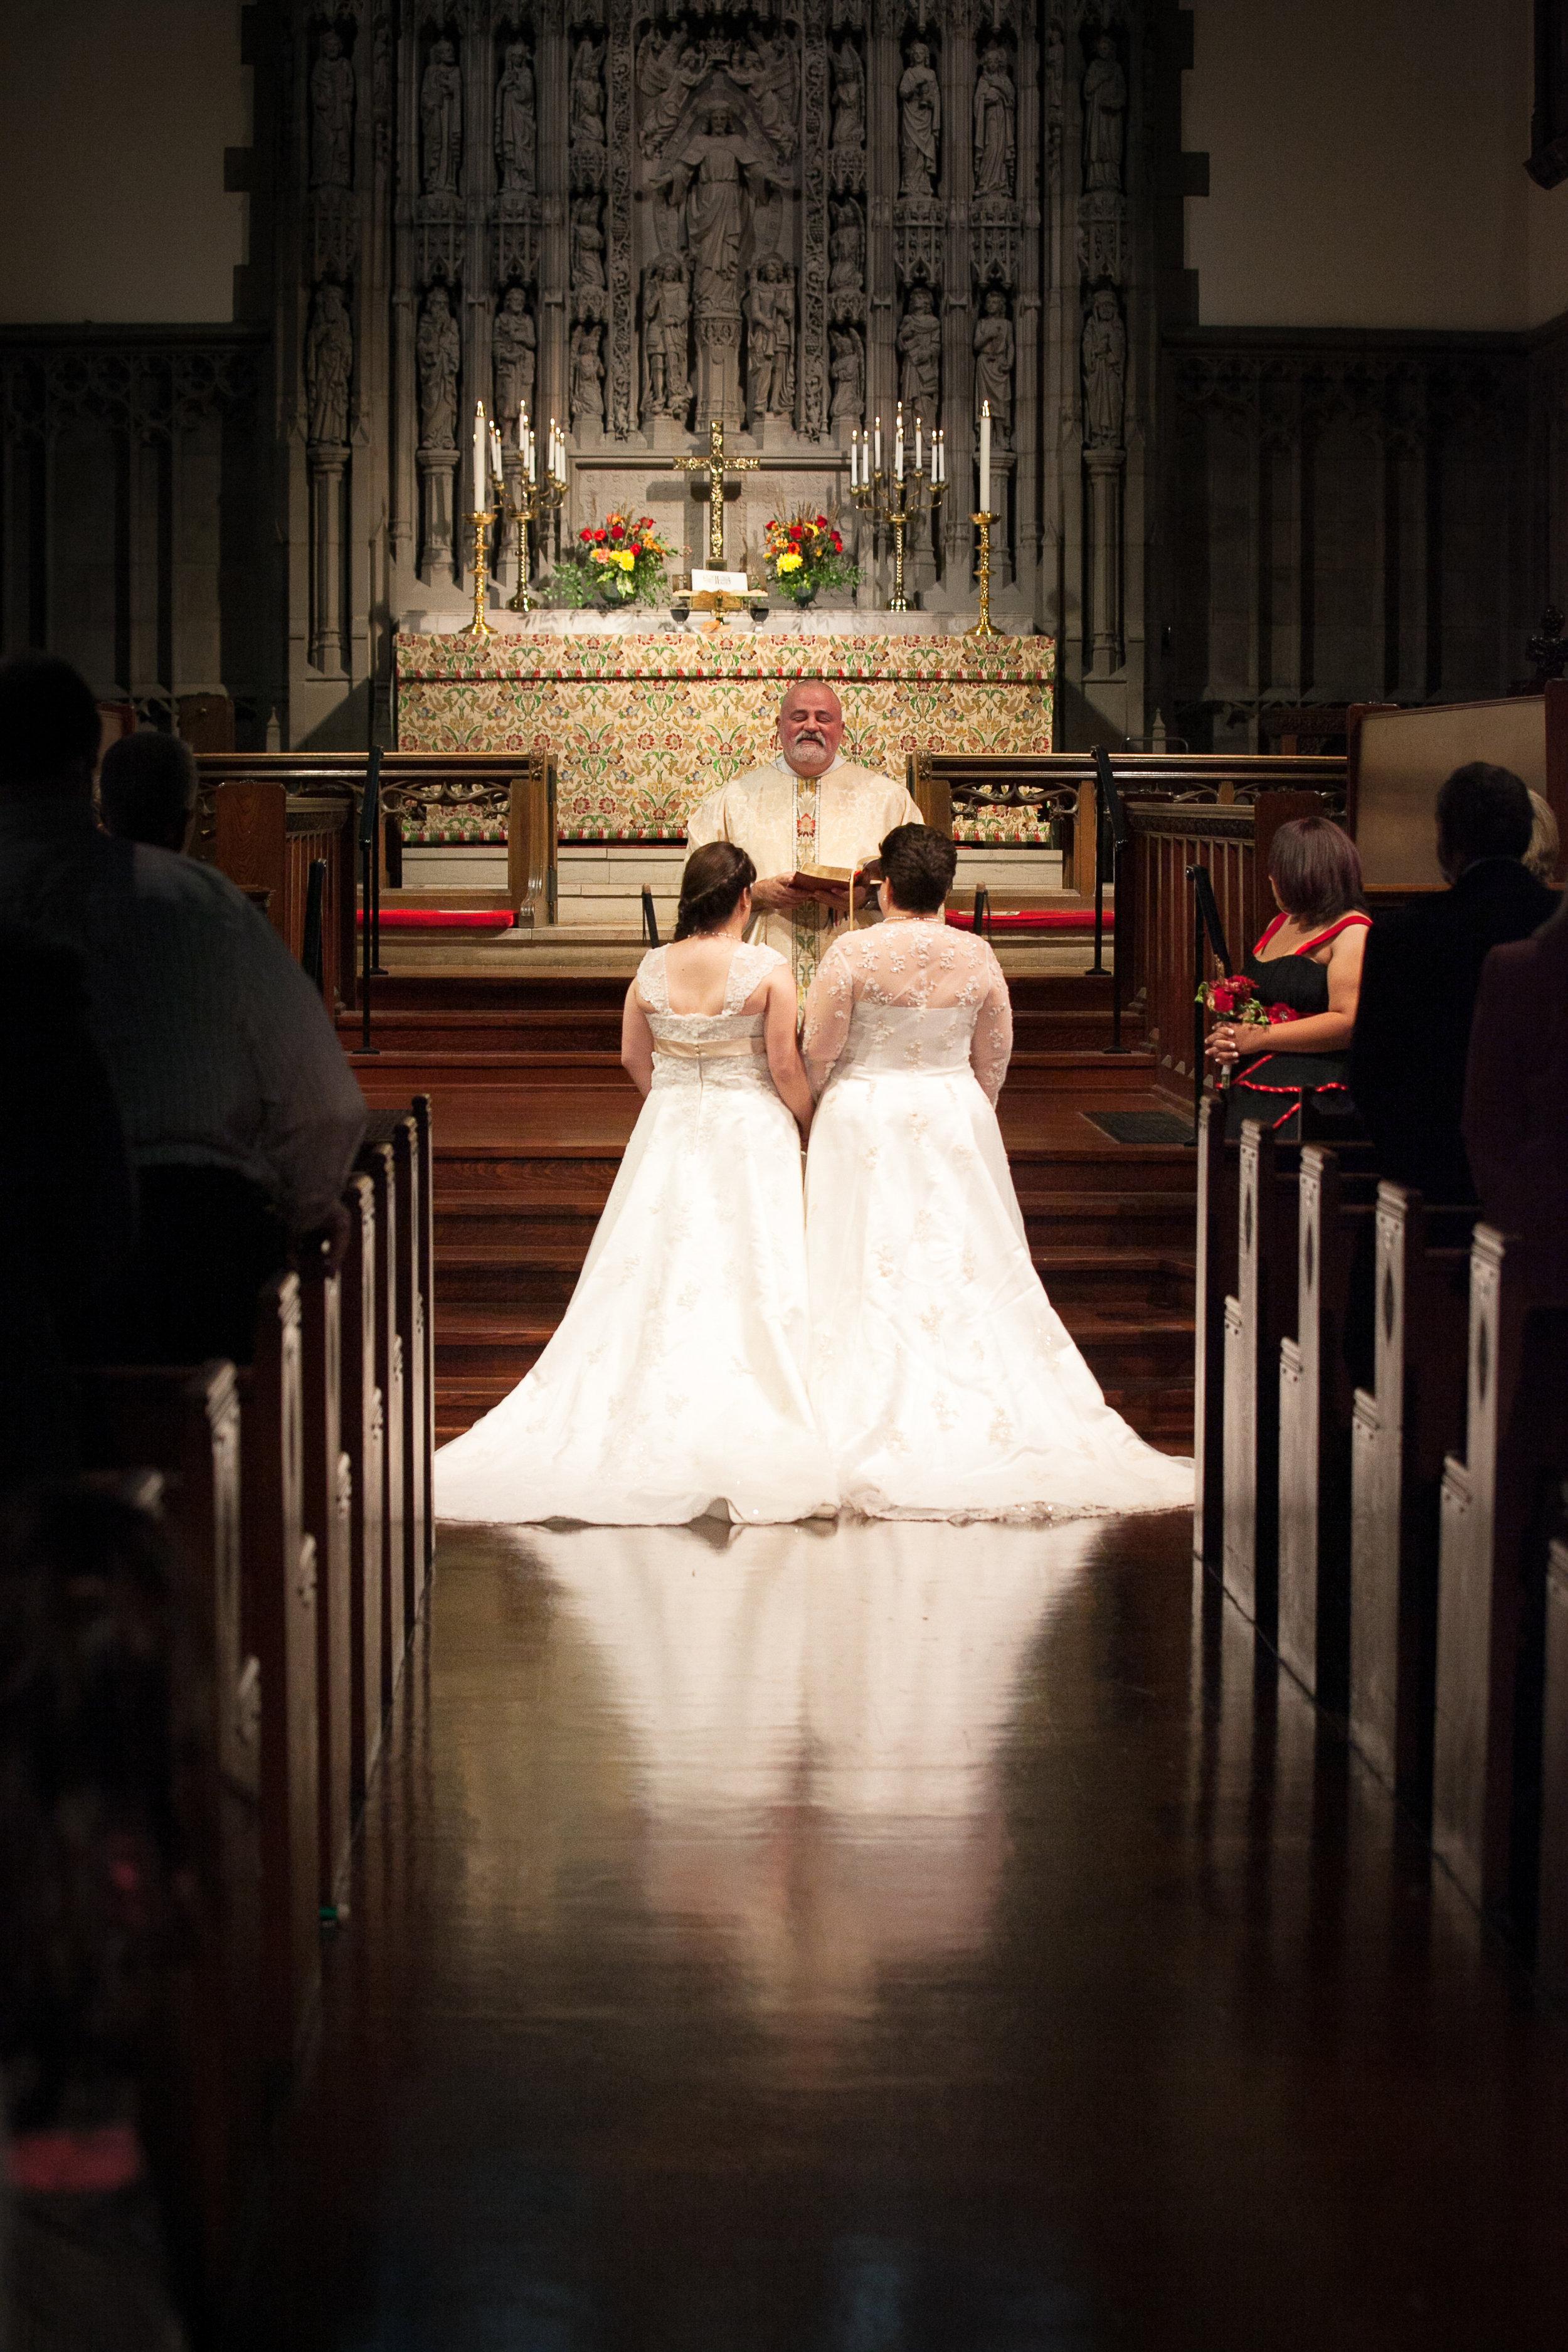 A wedding in Emmanuel's magnificent sanctuary.